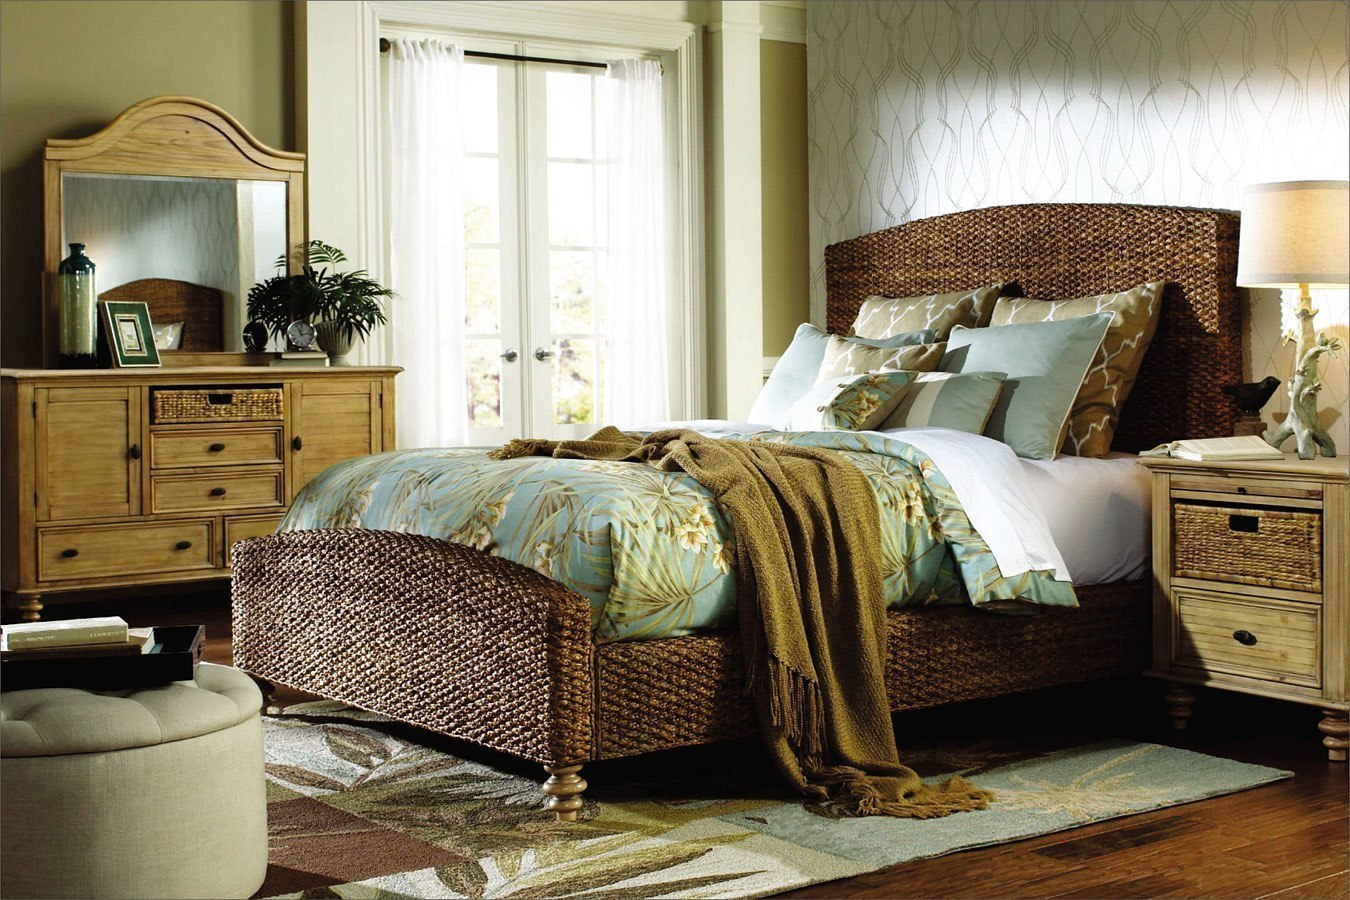 Hampton Bedroom Set w/ Seagrass Bed